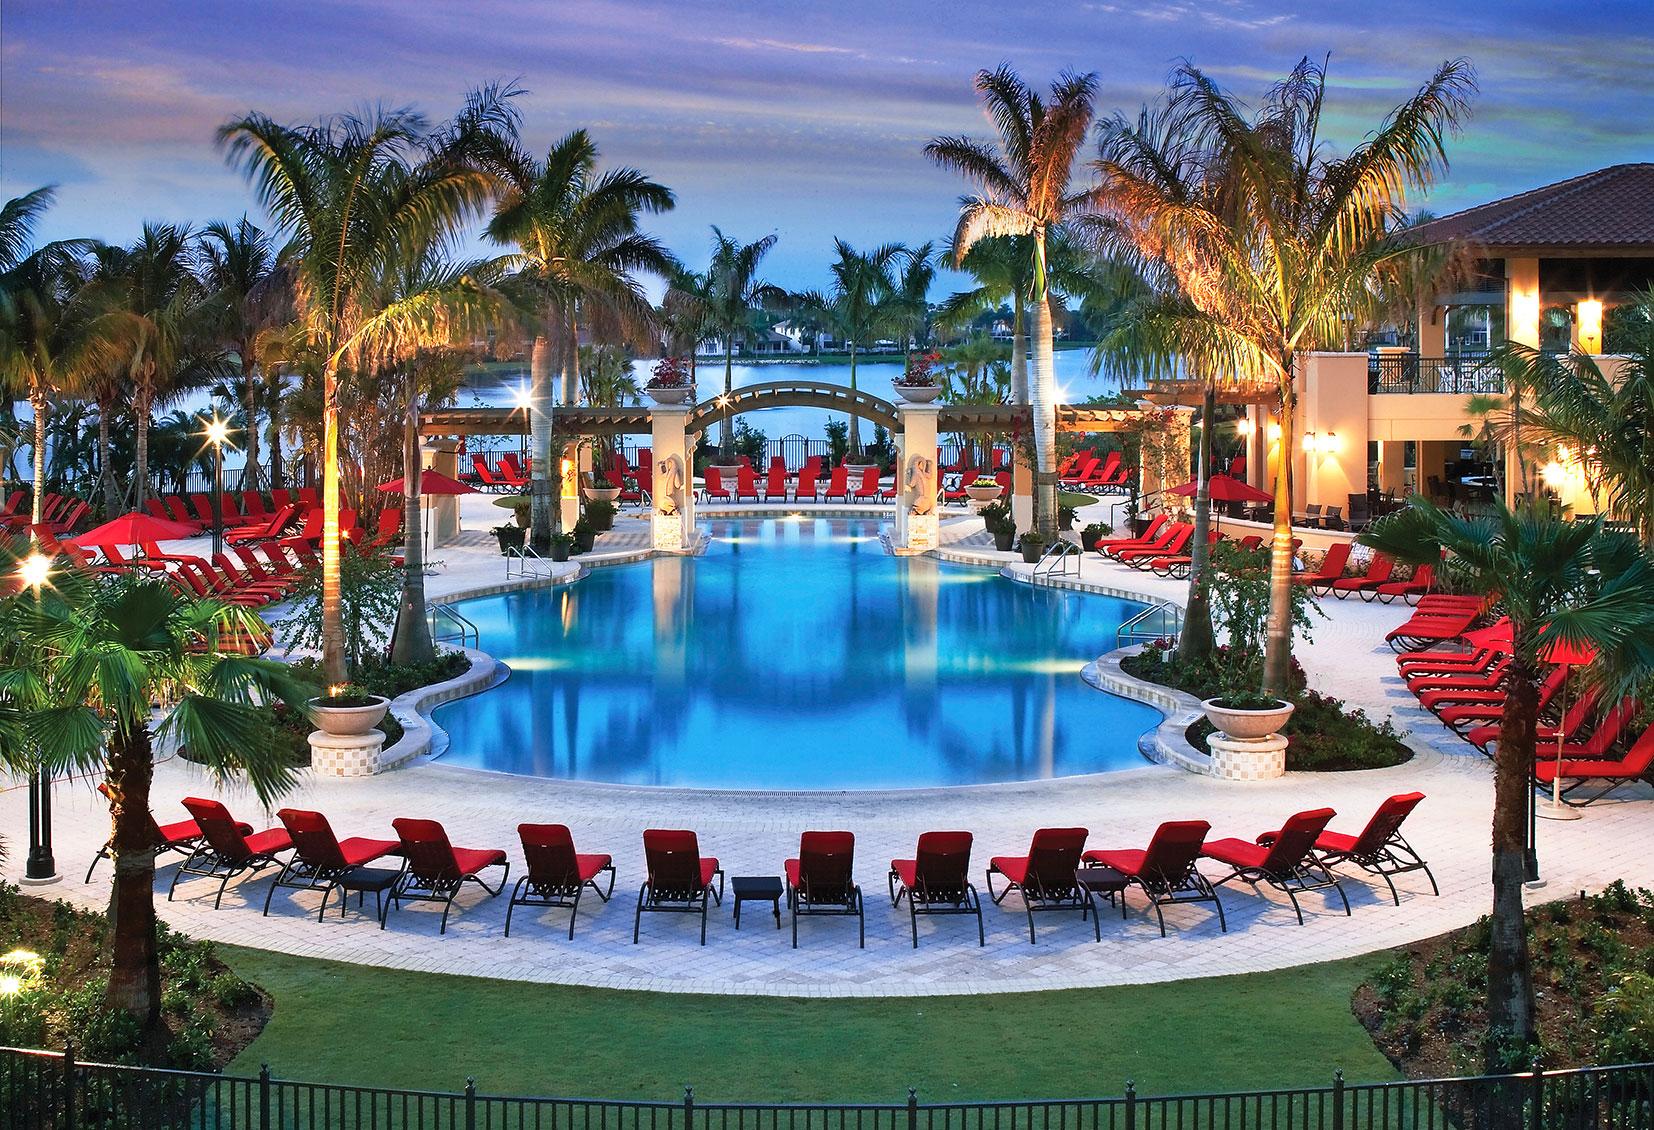 PGA-National-Resort-and-Spa-Pool2.jpg